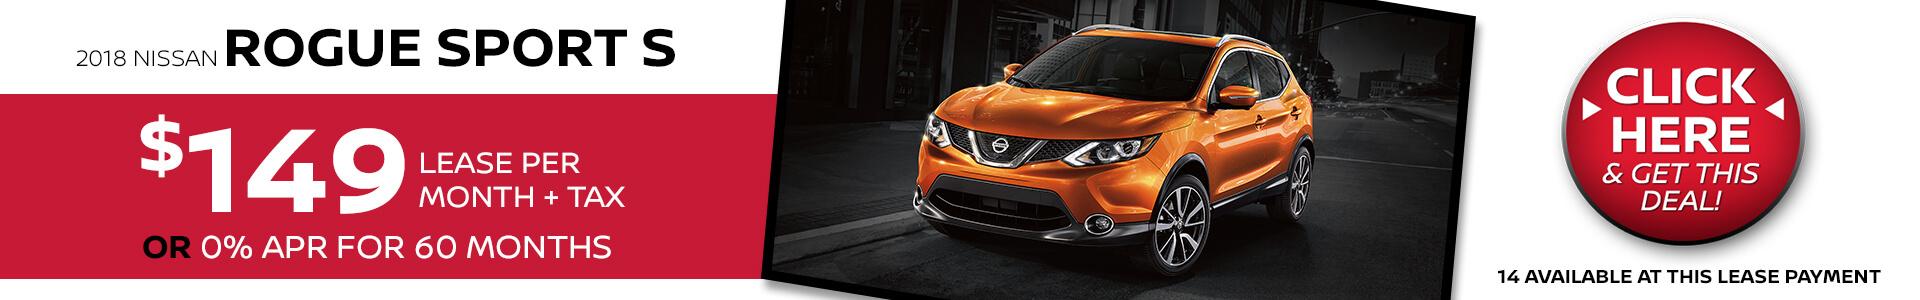 Nissan Rogue Sport $149 Lease